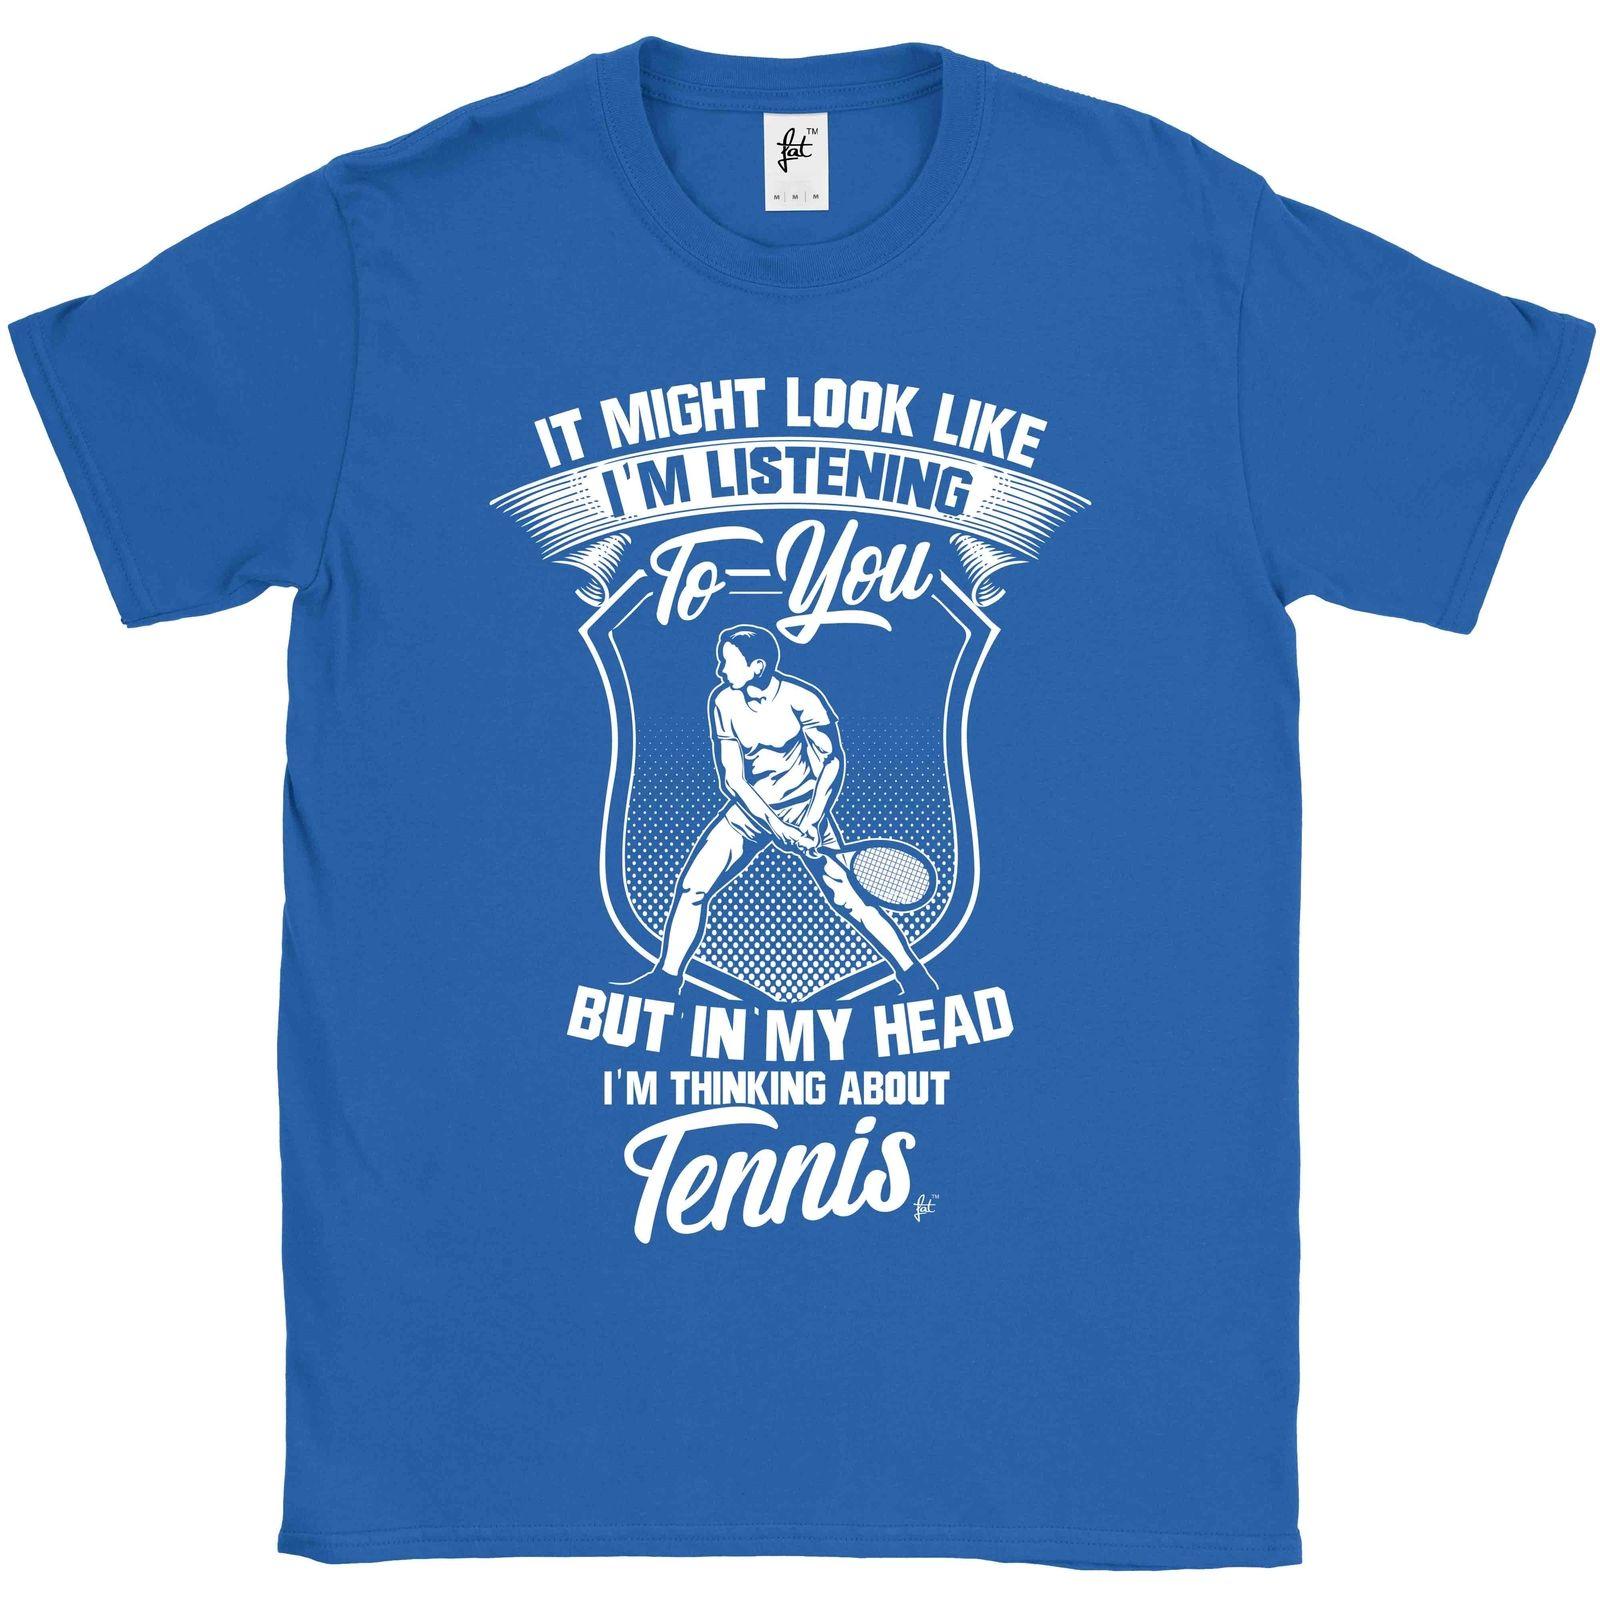 2019 moda venda quente olhar como eu estou ouvindo, mas eu estou pensando sobre tennisballen masculino camiseta camisa